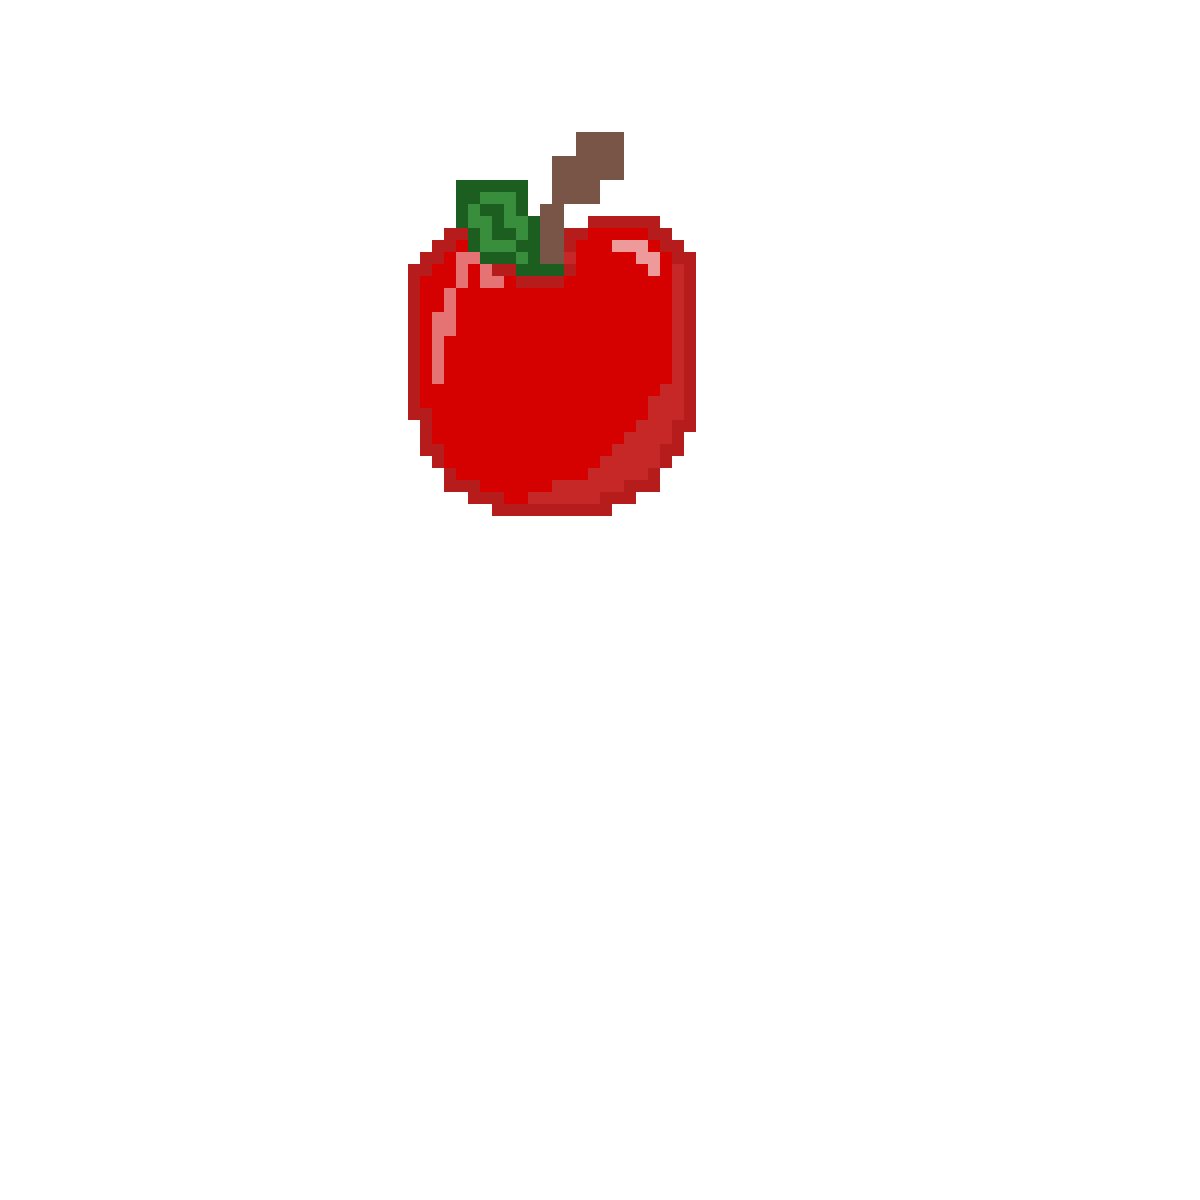 main-image-apple (work in proggres)  by Sneakybro07